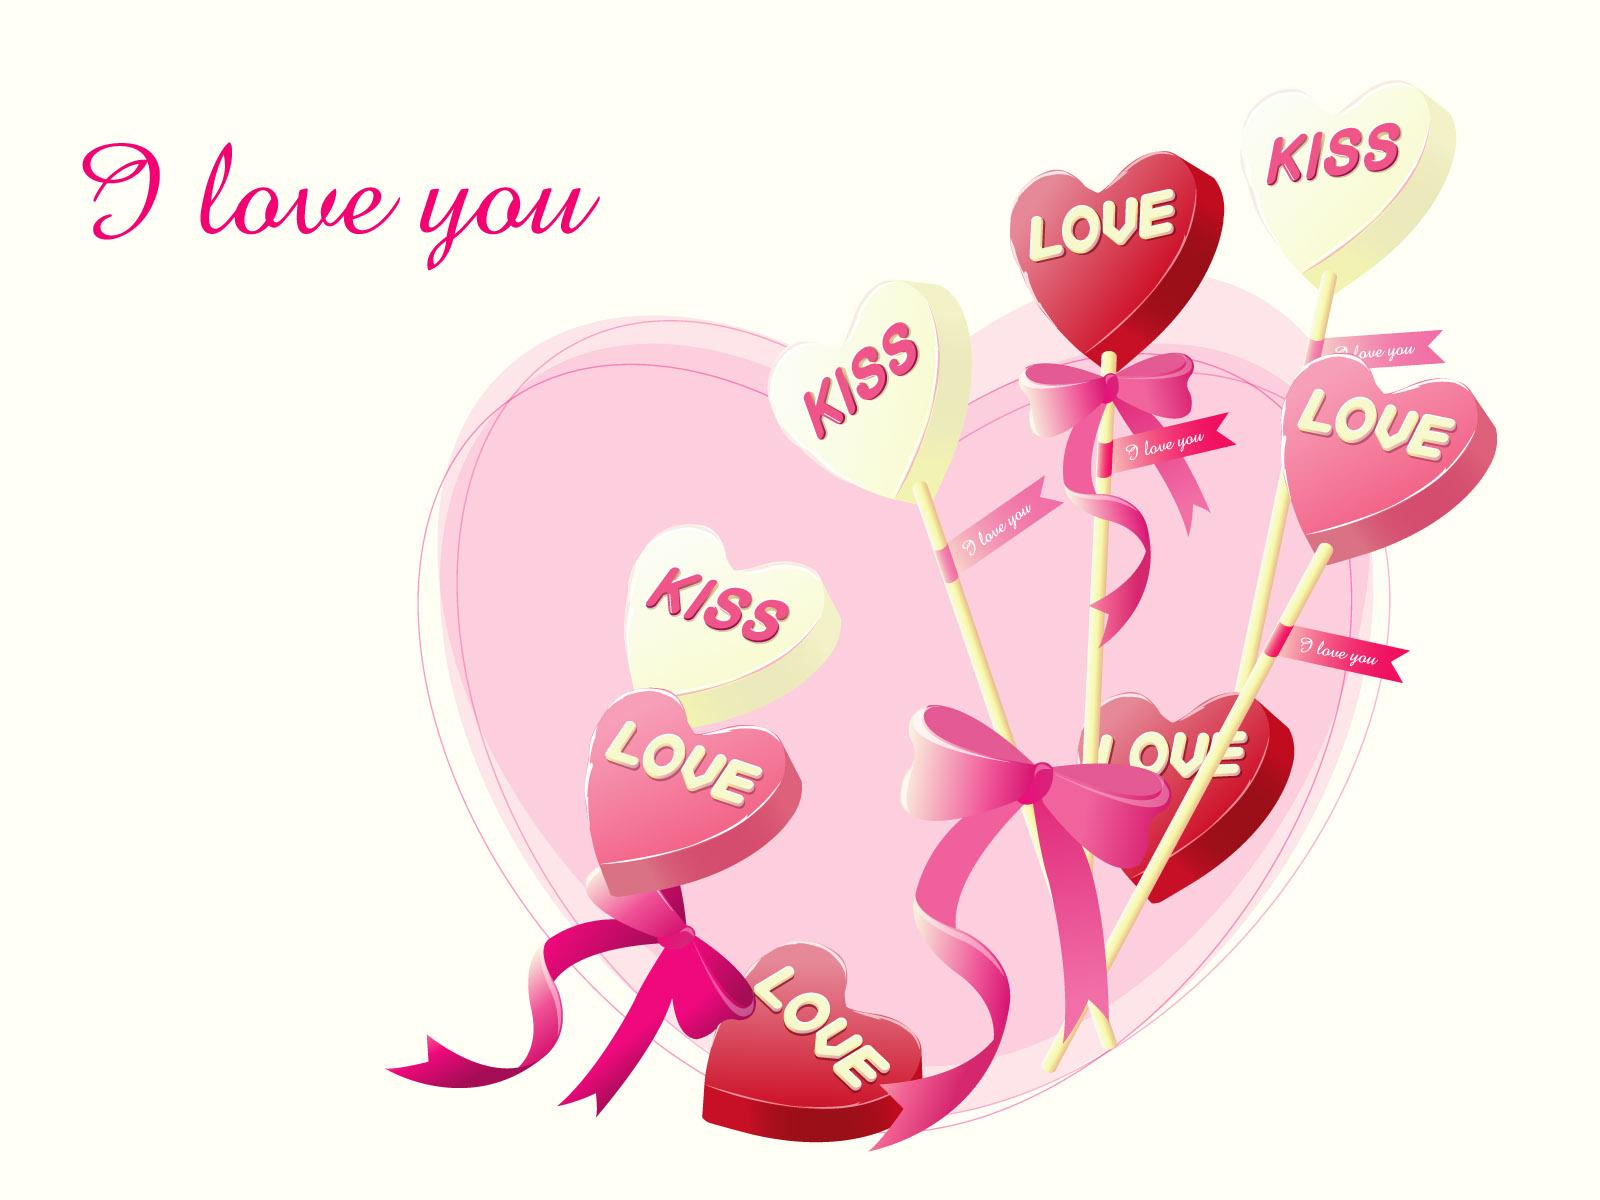 http://2.bp.blogspot.com/-yDGpPIBdO34/UClr8k4Oj9I/AAAAAAAAKxo/cMPjHhhaizs/s1600/i_love_u_quotes_wallpapers+(11).jpg